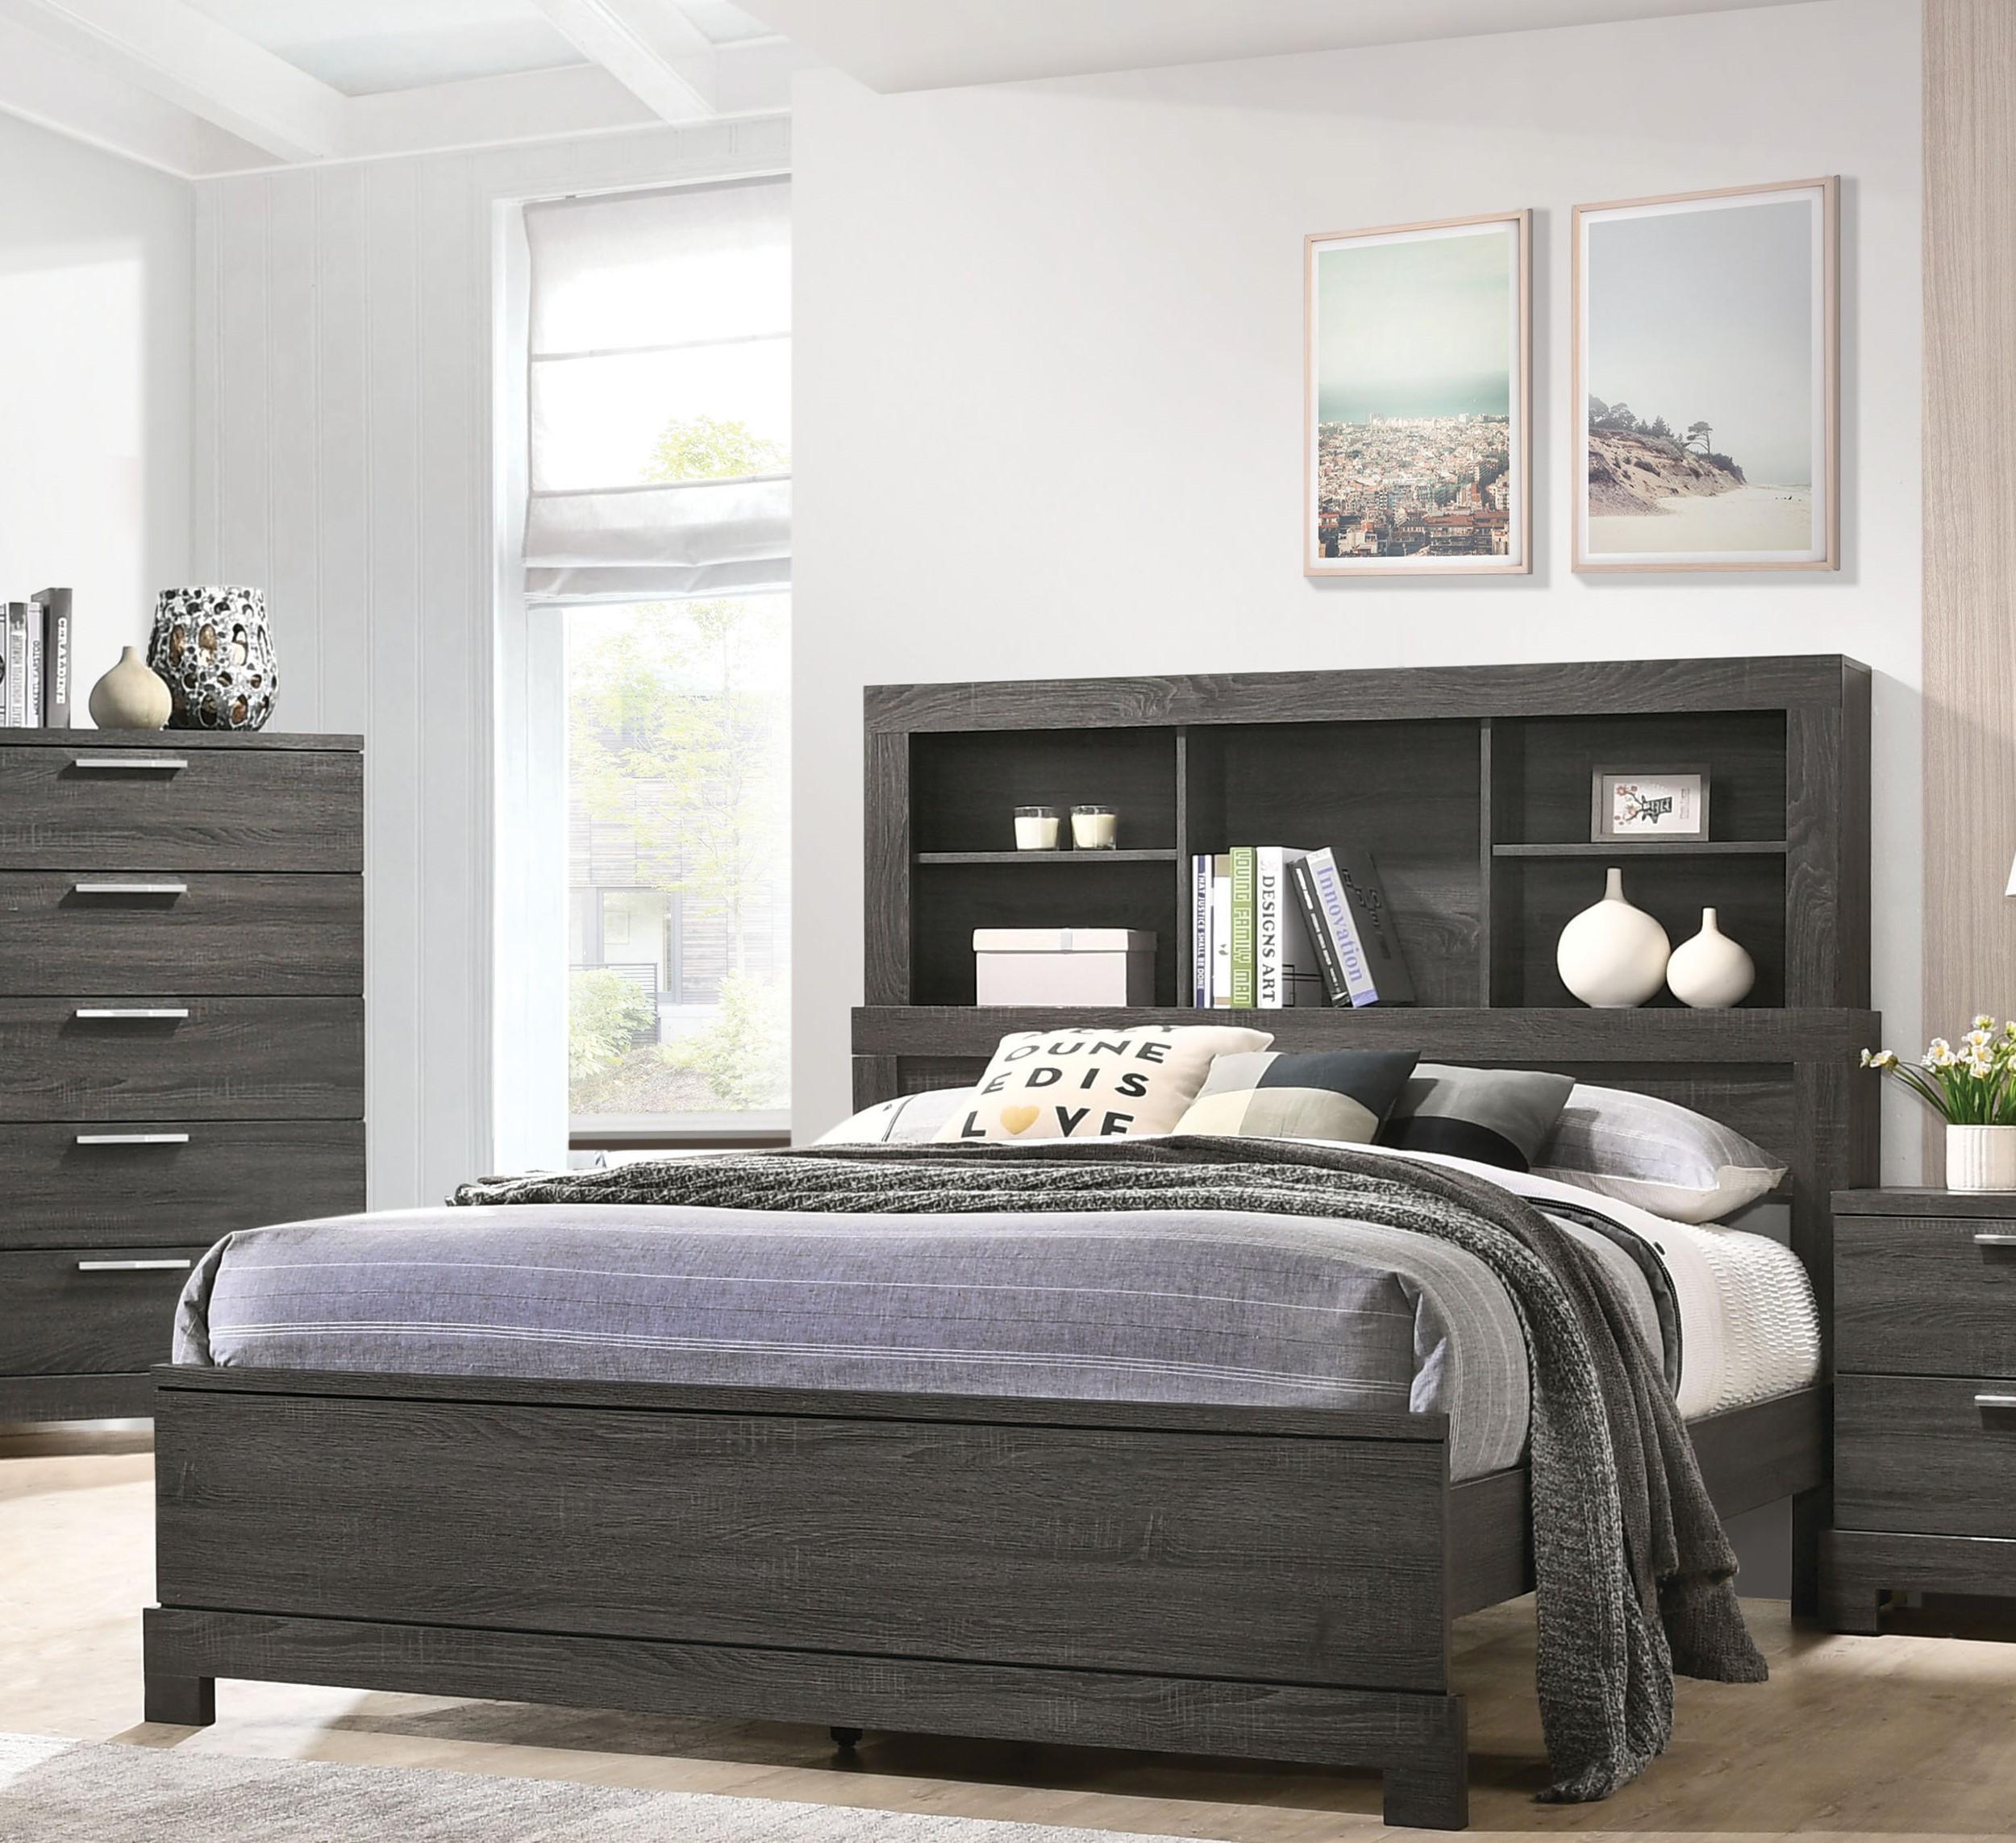 Transitional Gray Finish Bookcase Storage Headboard King Bed Lantha 22027ek Acme 22027ek